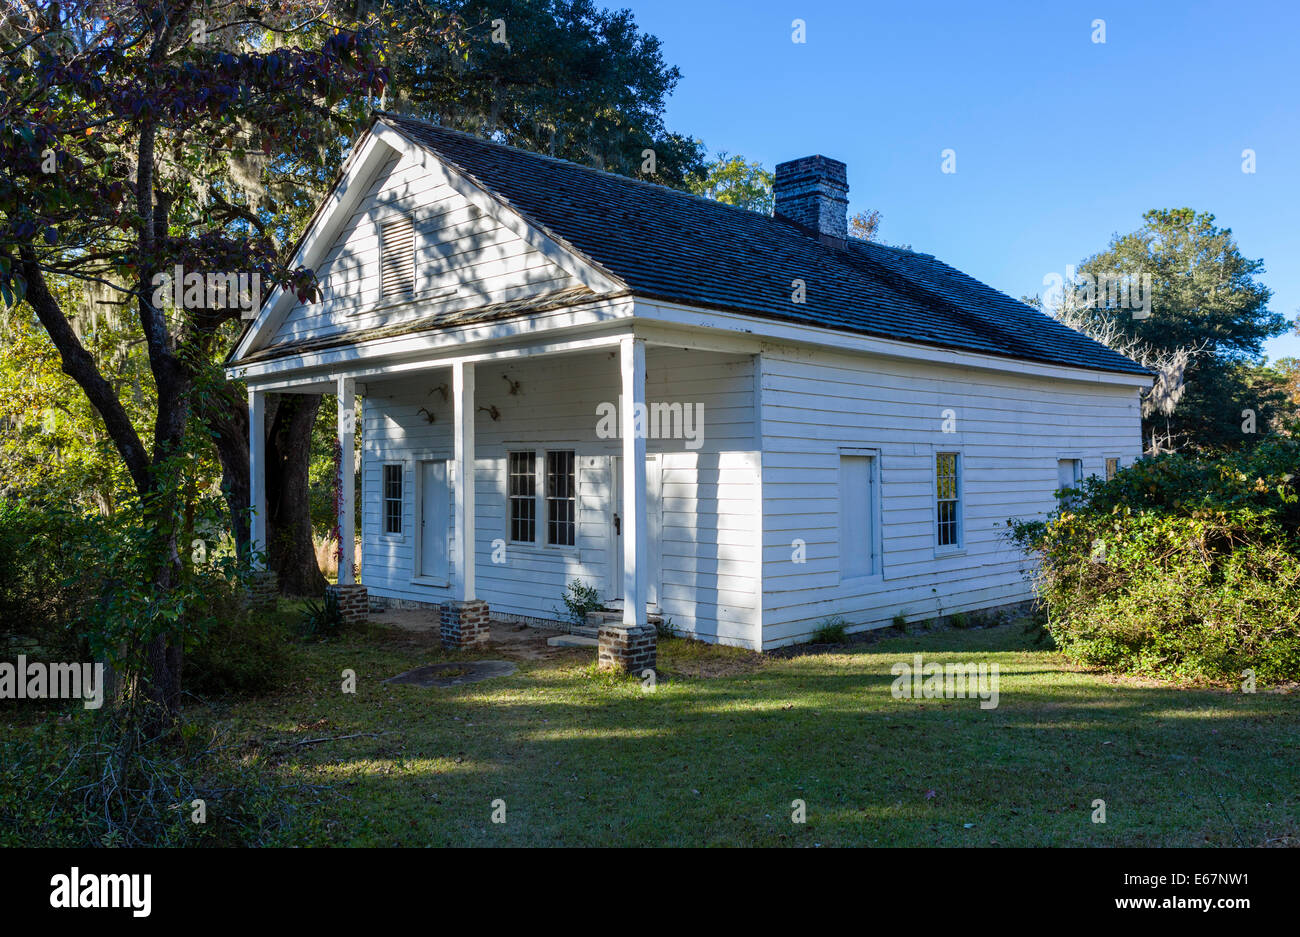 Plantation Kitchen House The Kitchen House At Hampton Plantation State Historic Site Stock